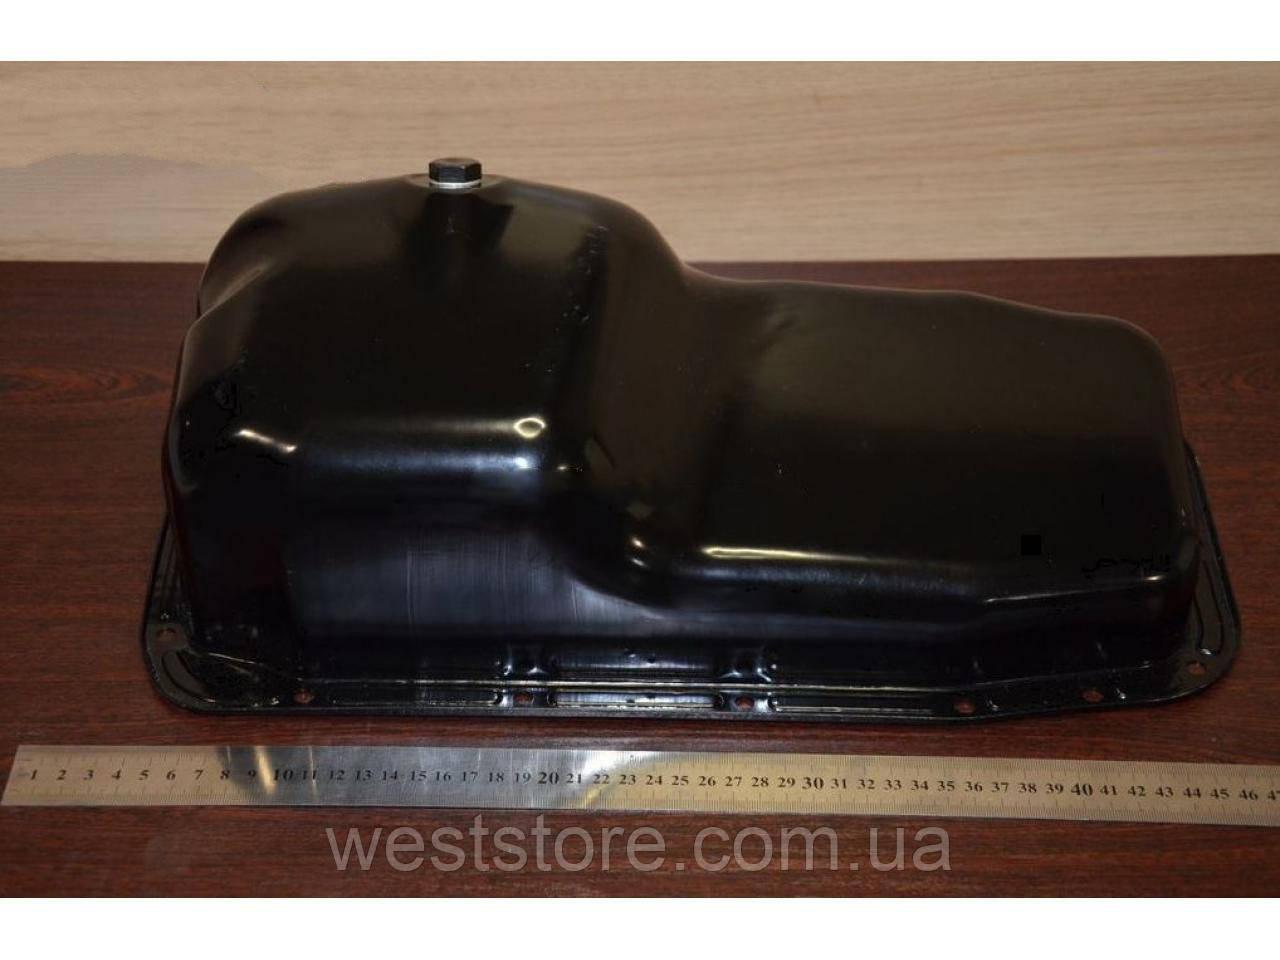 Поддон двигателя Маслянный картер  Lanos 1.5-1.6 (метал.) 96351480